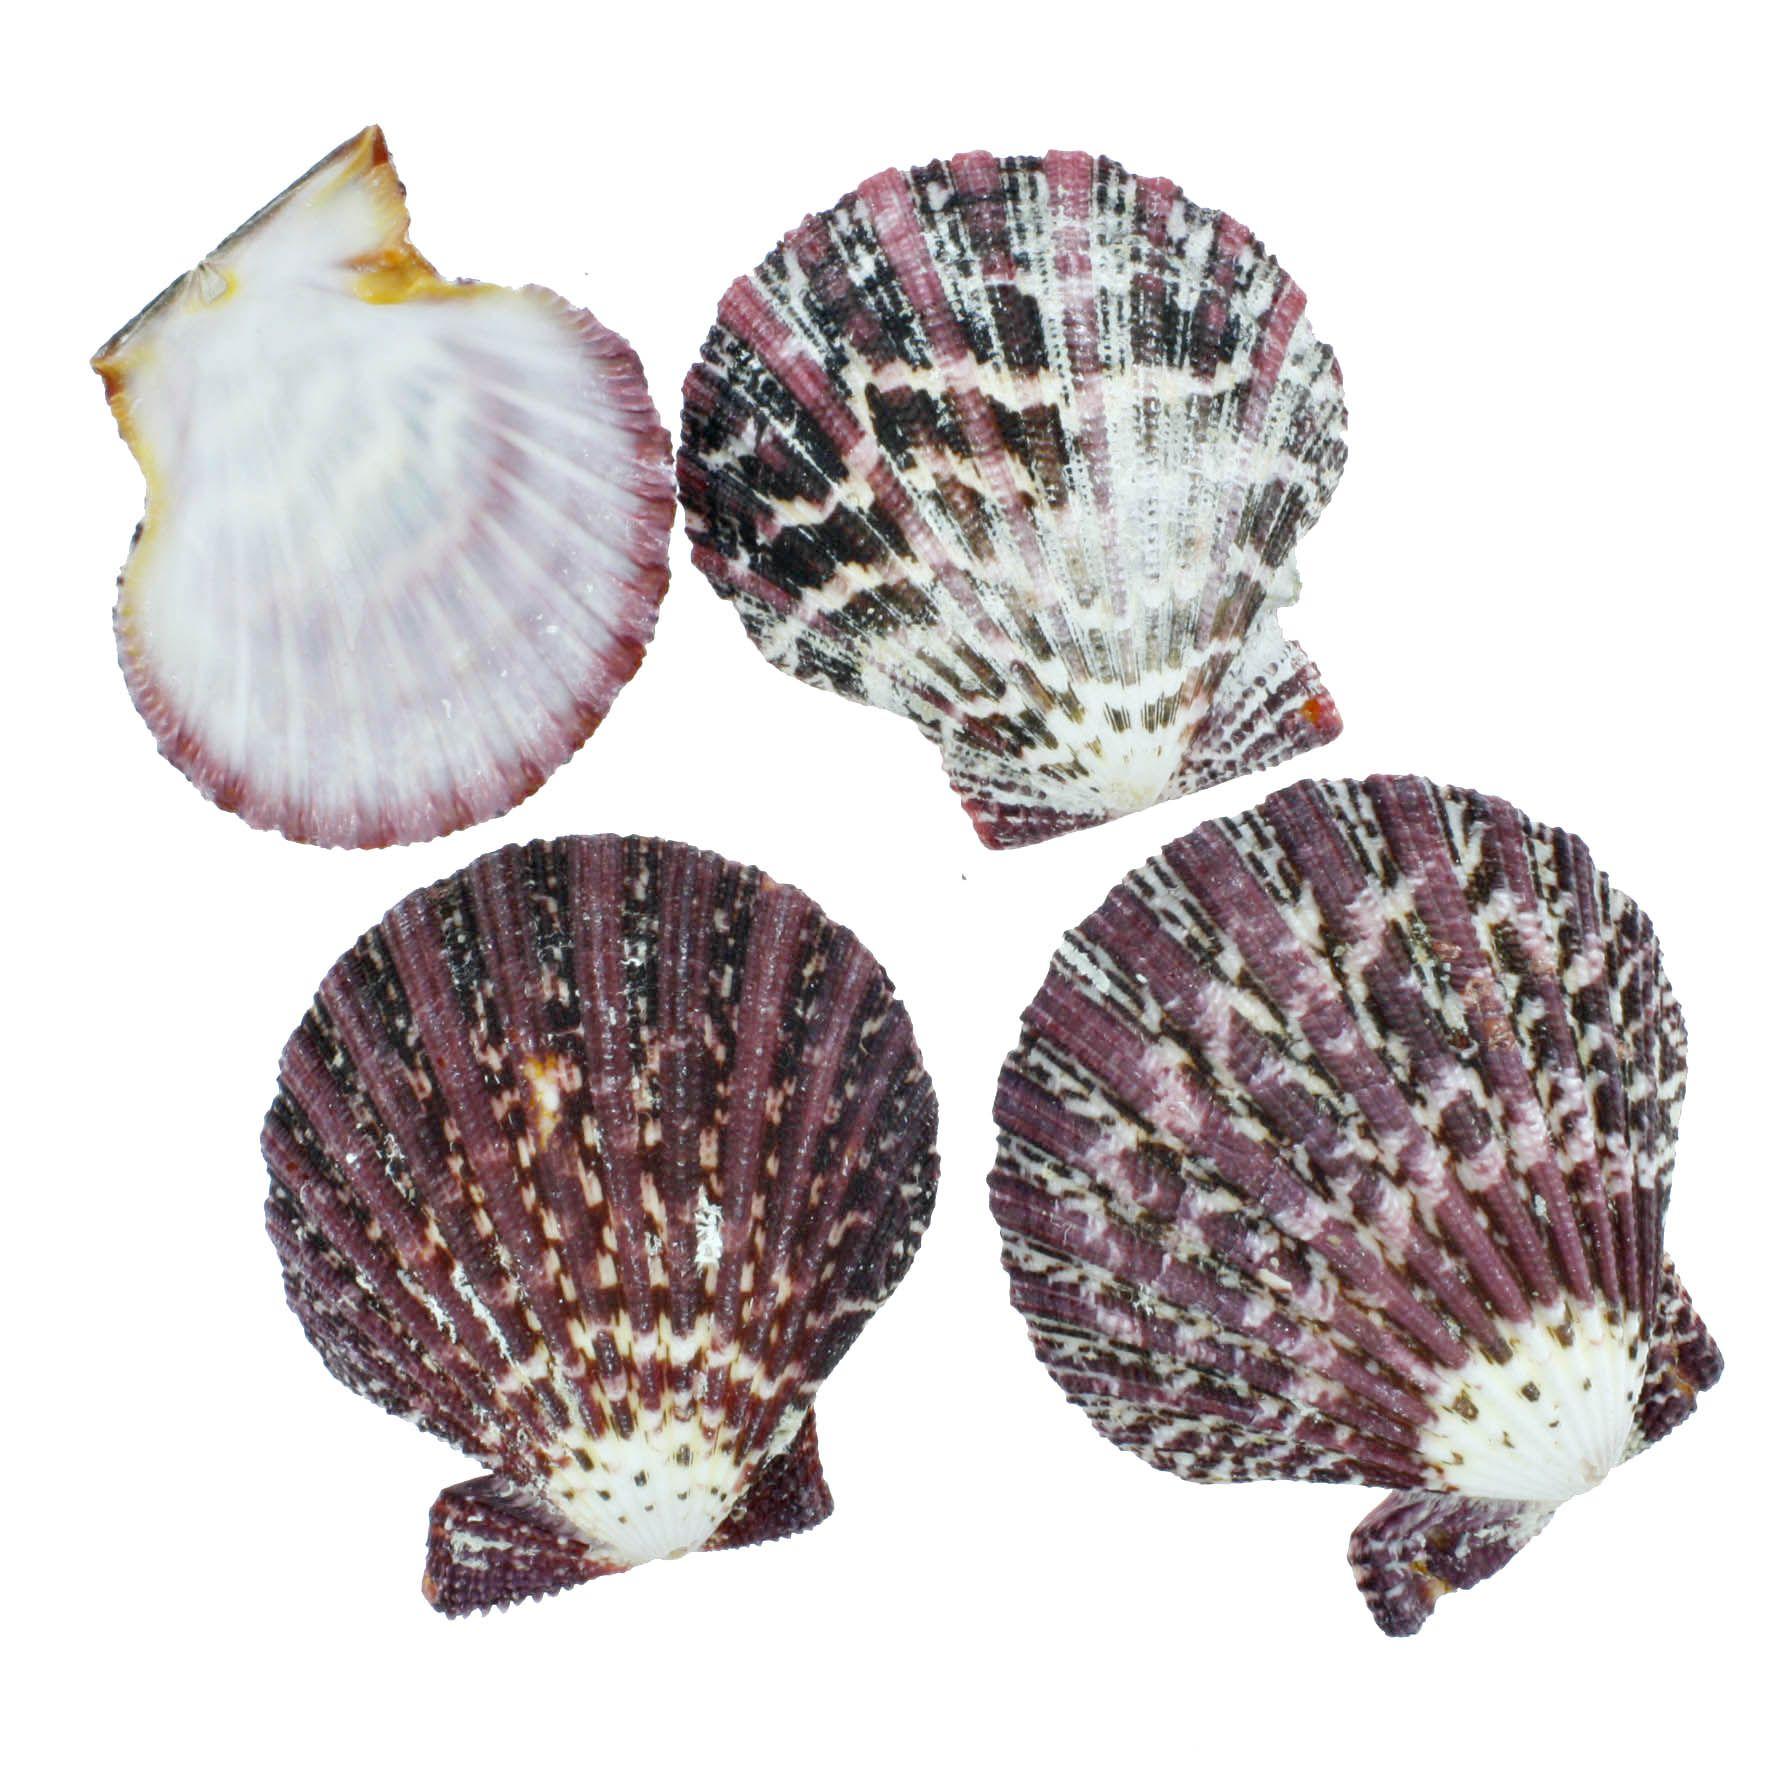 Concha - Gloria Pallium (Scallop Shell)  - Universo Religioso® - Artigos de Umbanda e Candomblé